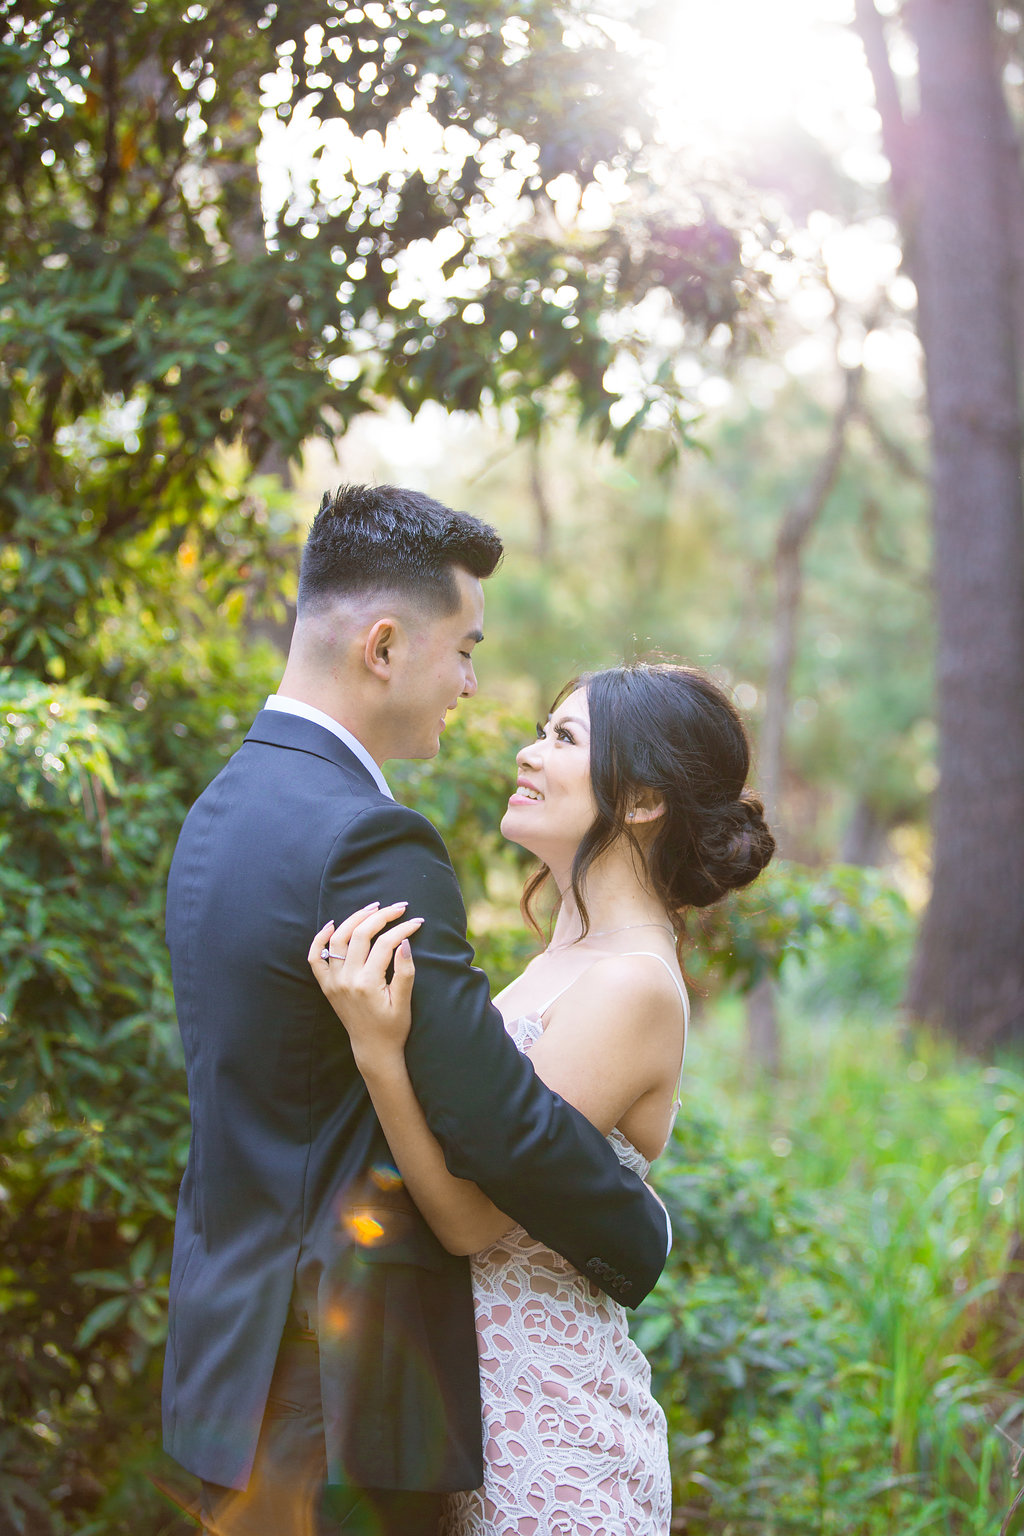 Sydney Professional Wedding Photographer - Asian Weddings - Jennifer Lam Photography - Centennial Parklands (6).jpg